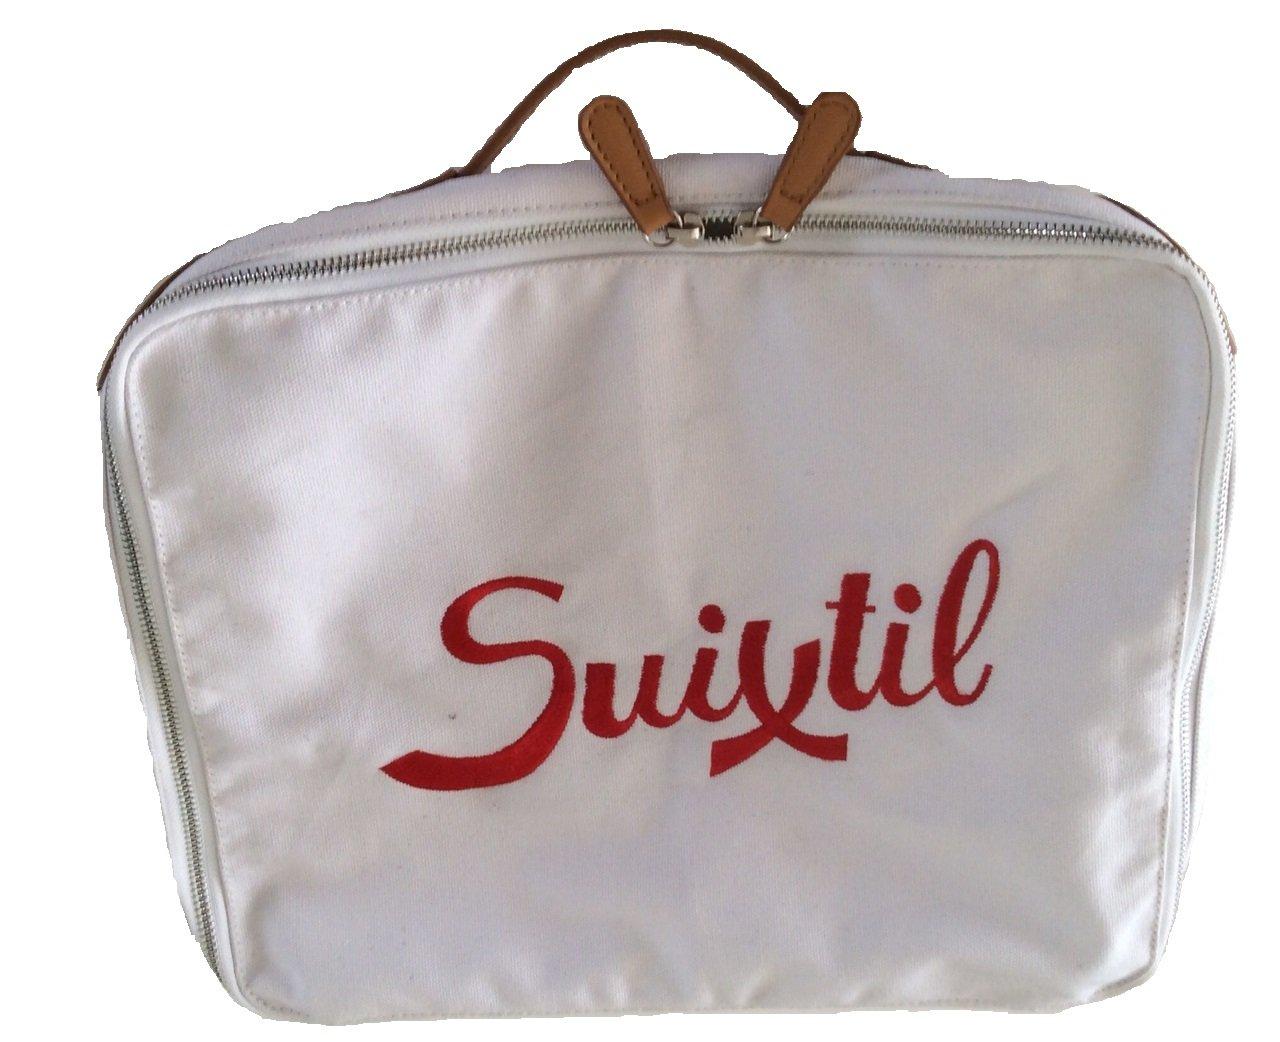 Suixtil Touring Map Bag, White, One size